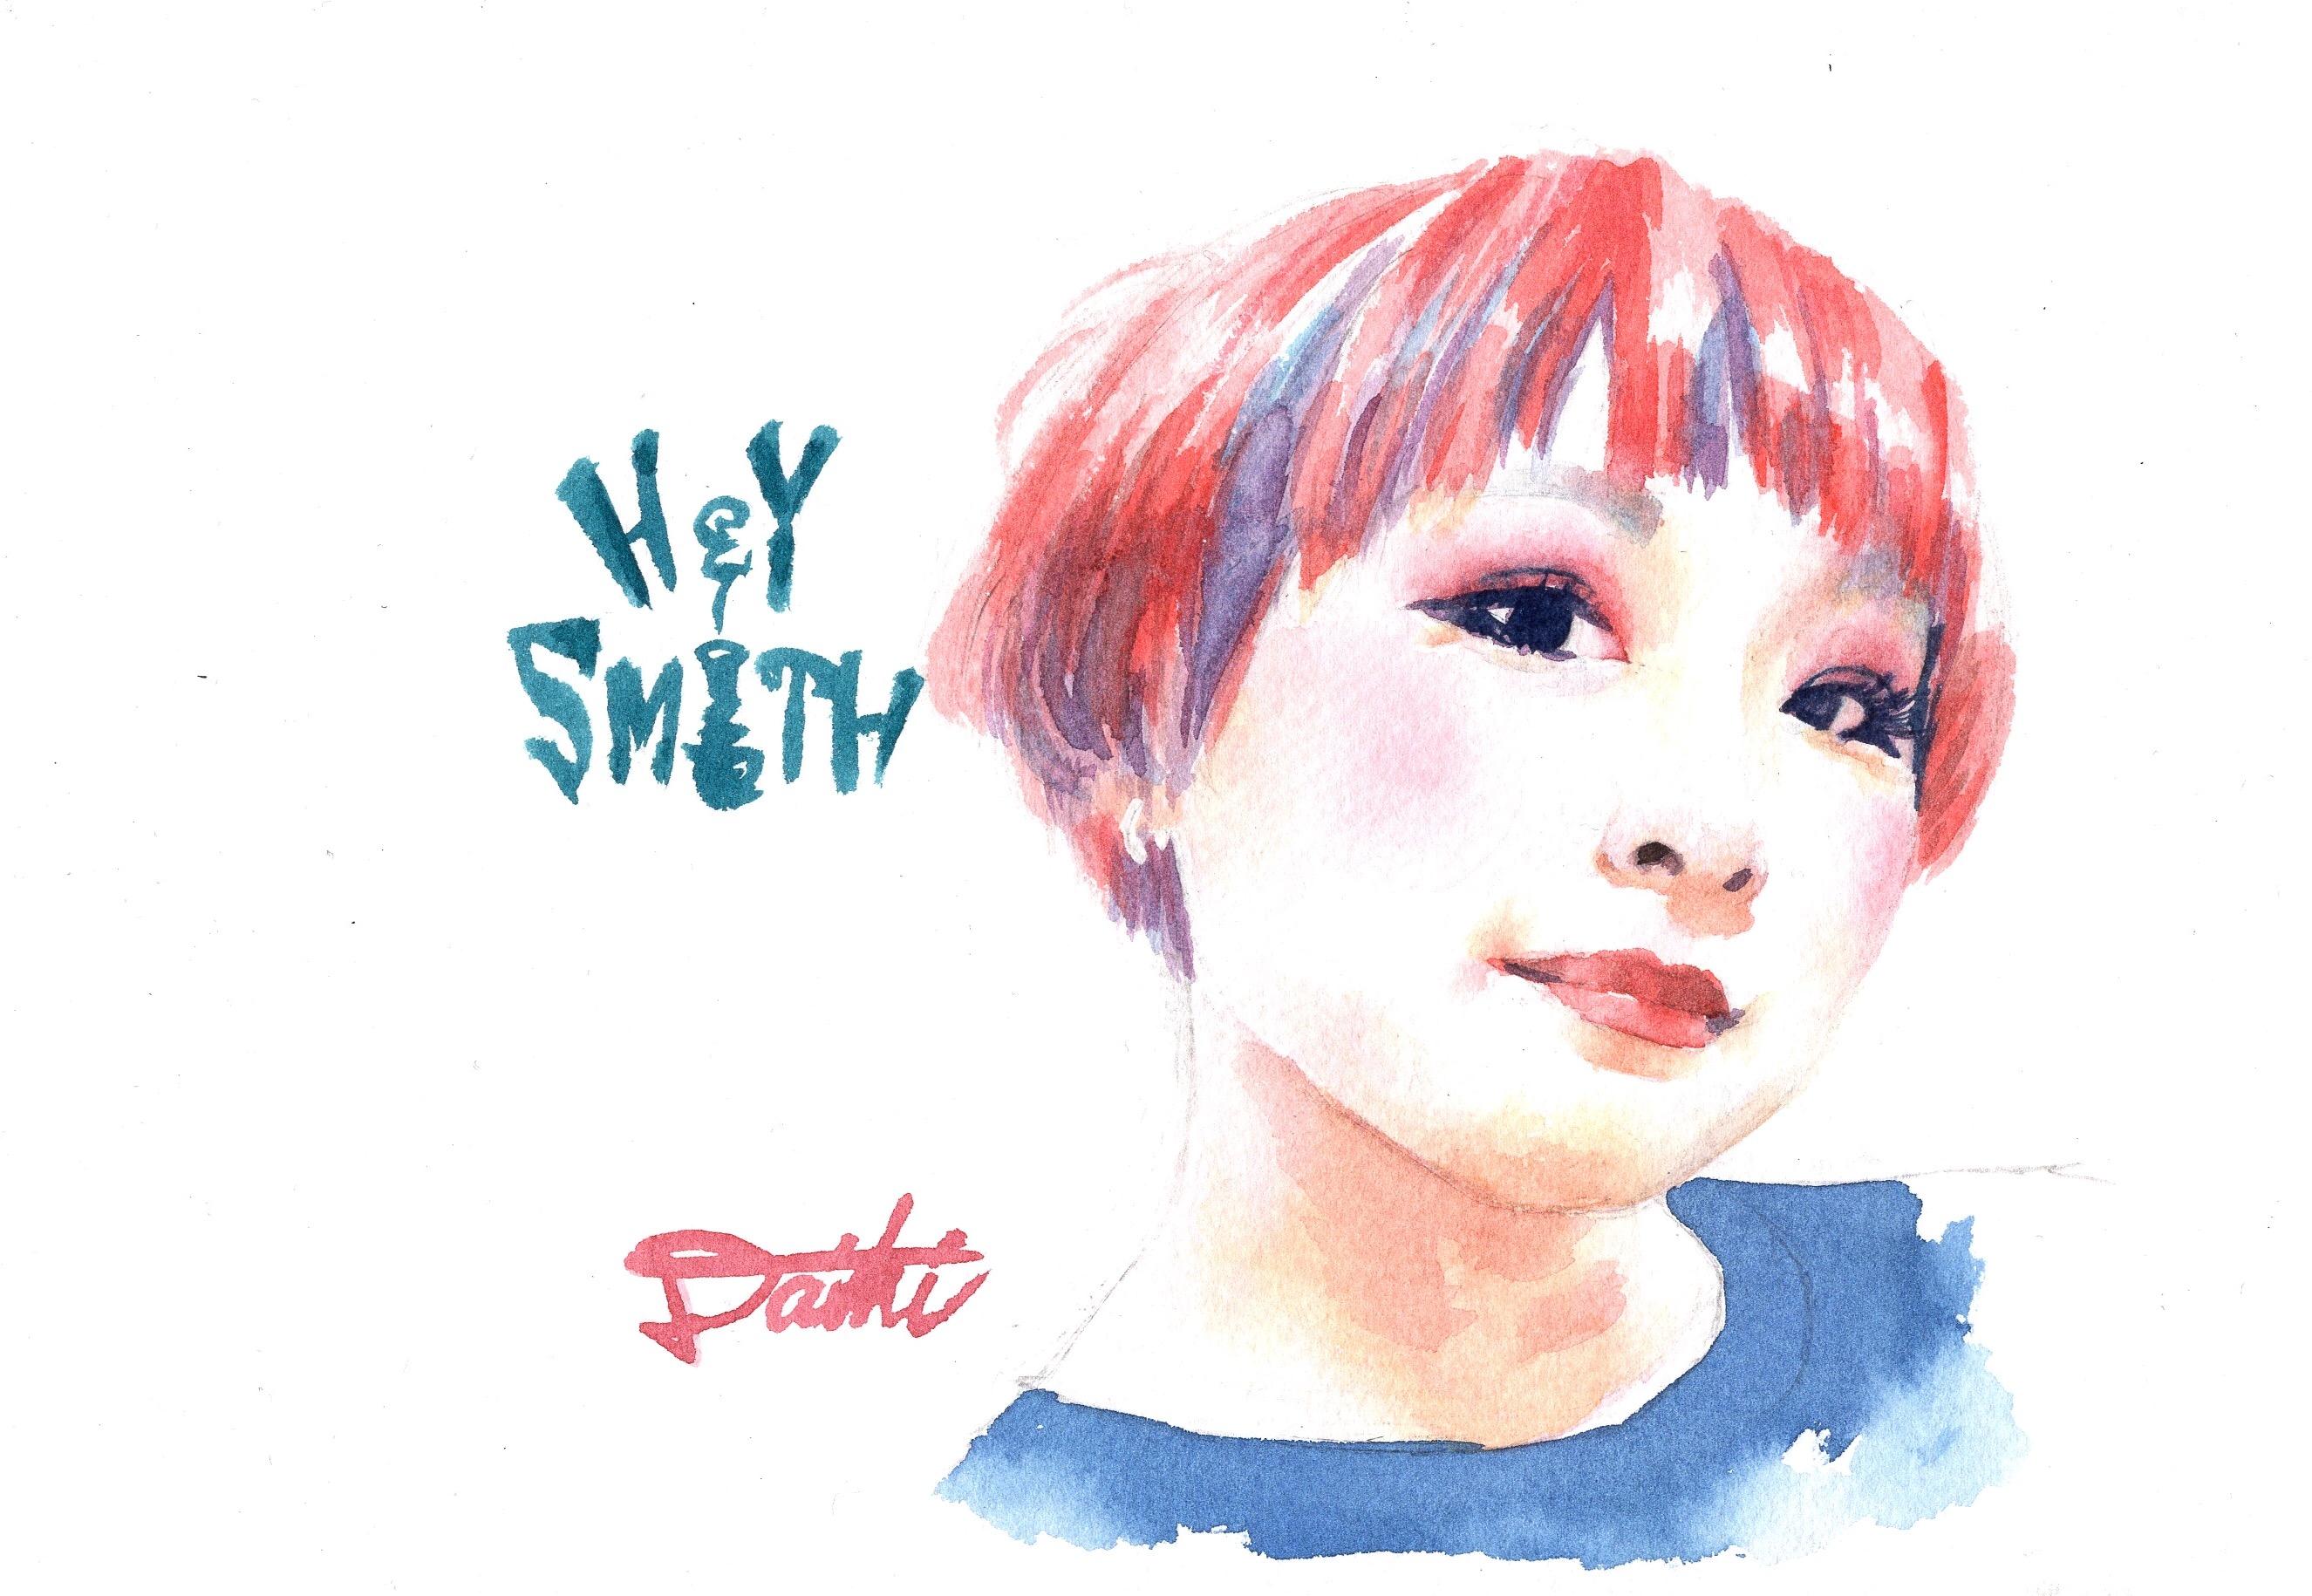 HEY-SMITH かなす 水彩似顔絵